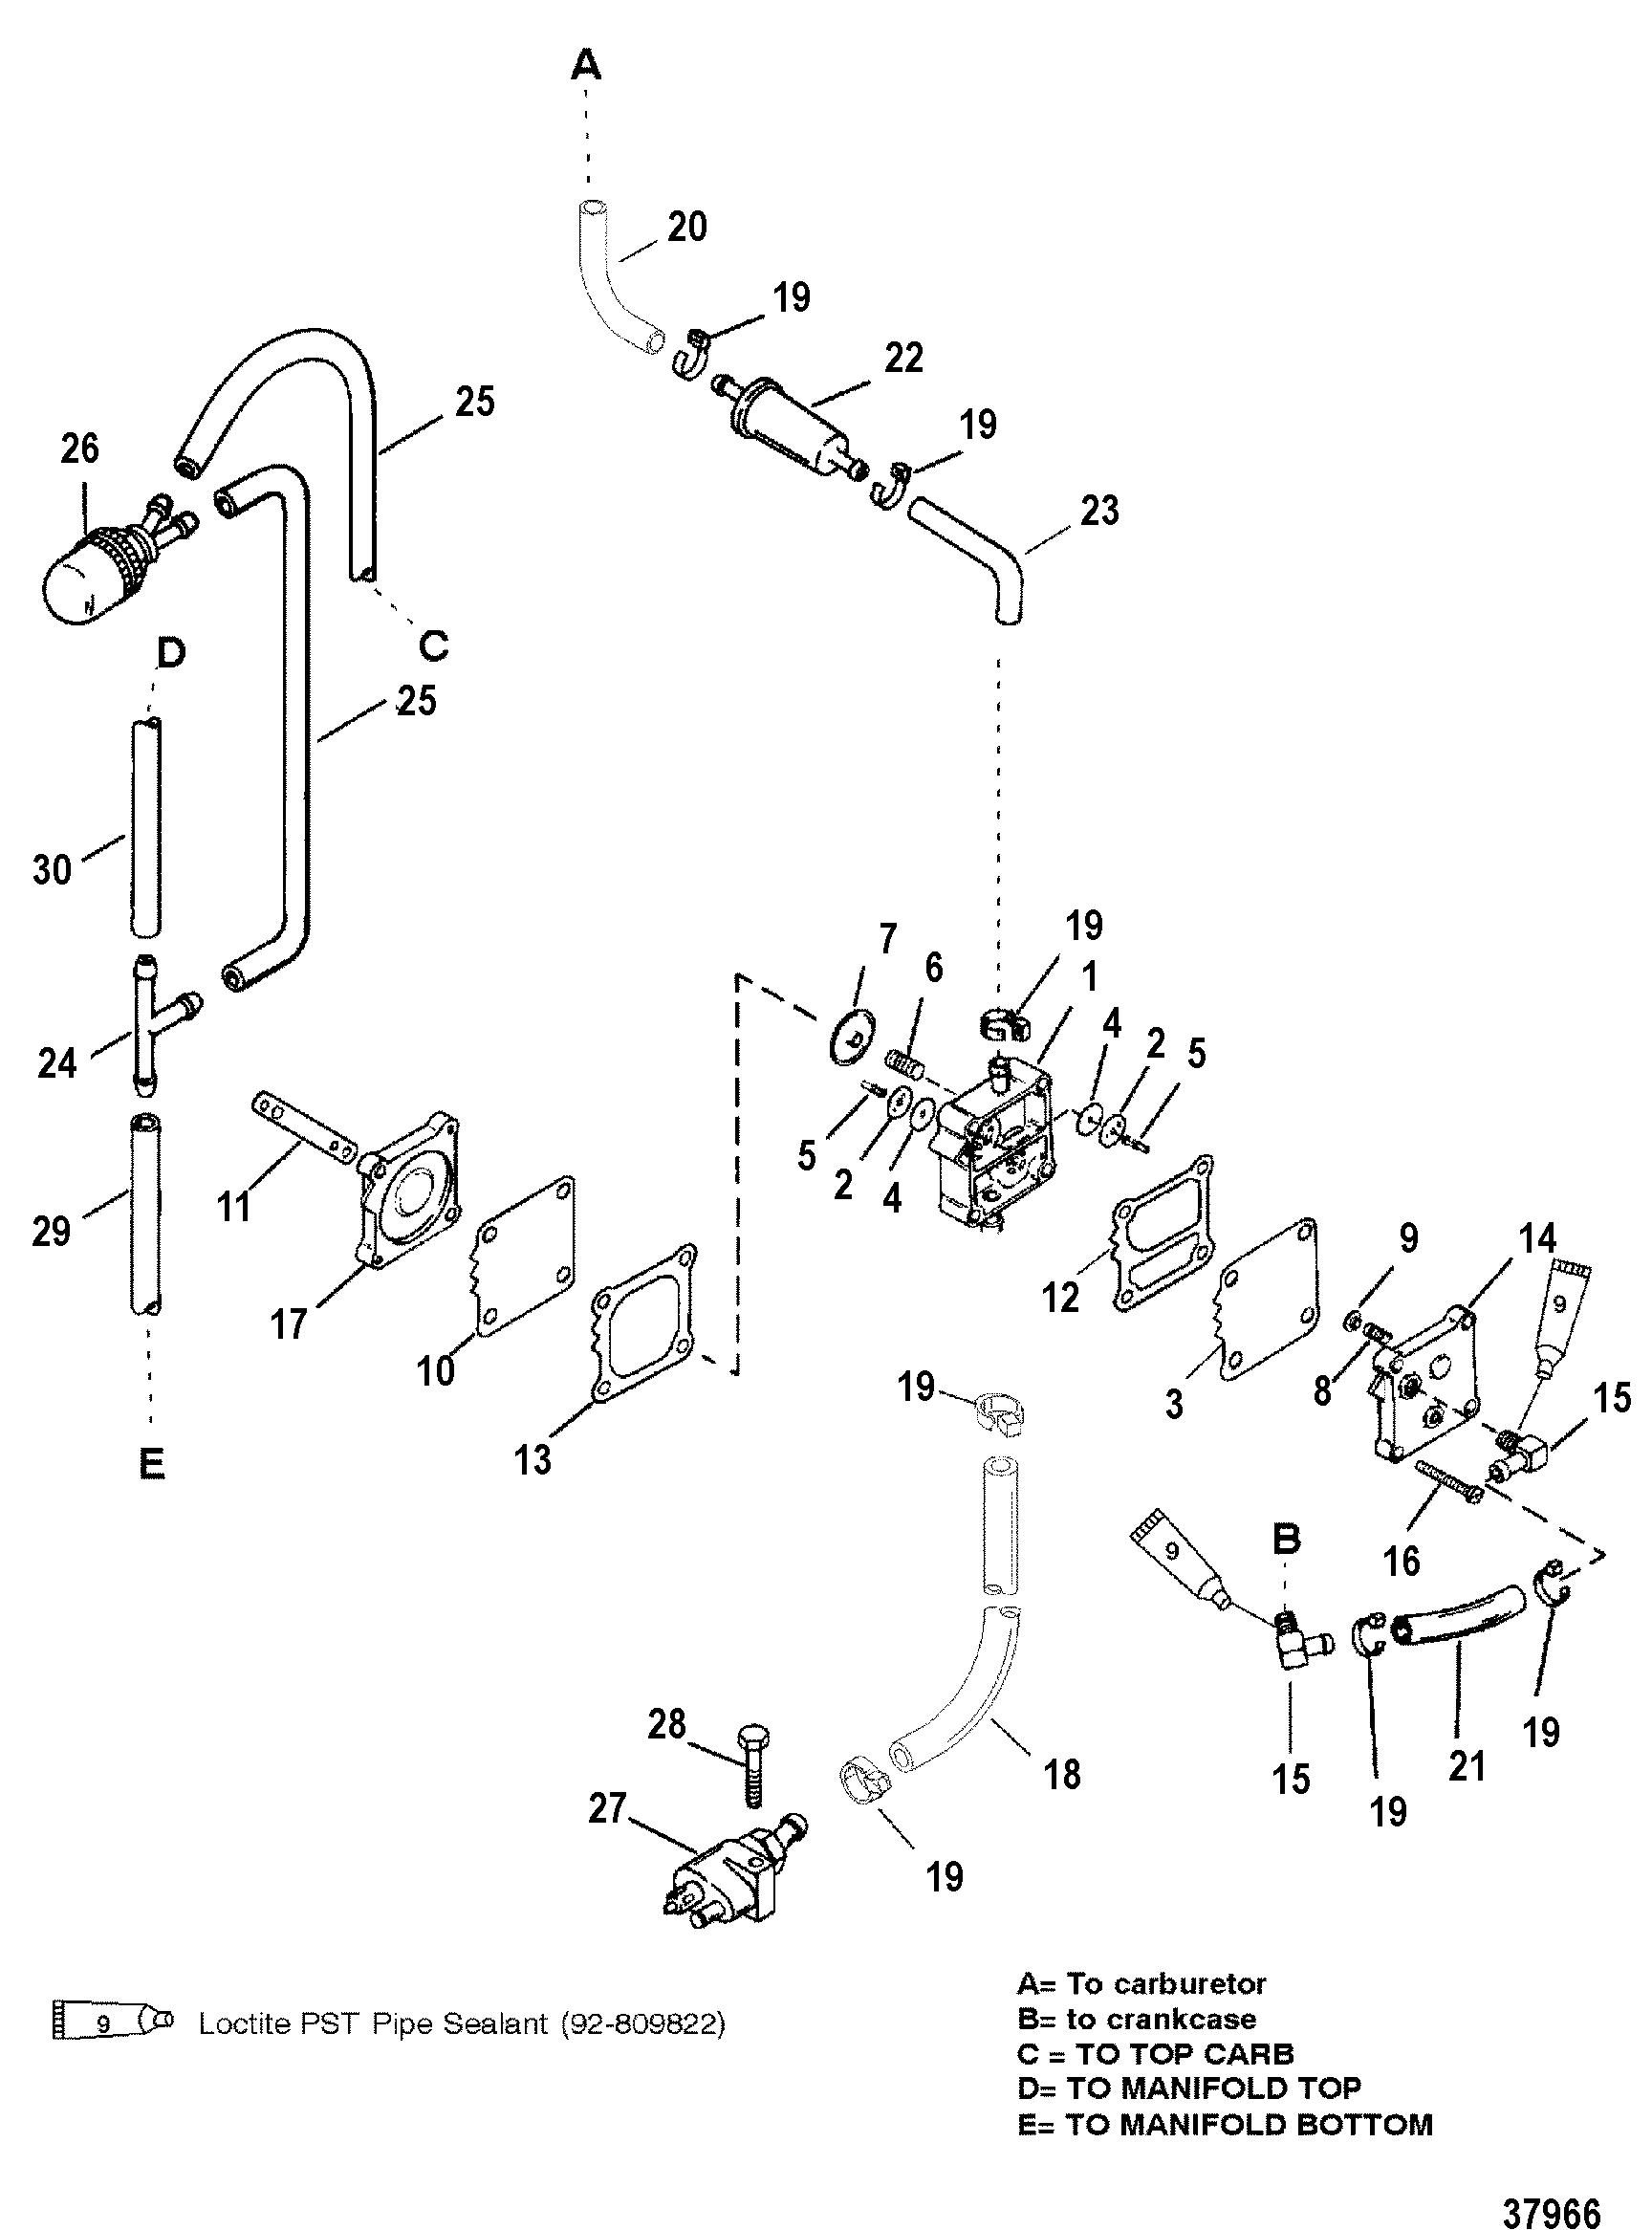 FUEL PUMP MANUAL FOR MARINER / MERCURY 40/50 H.P. JET 30 3